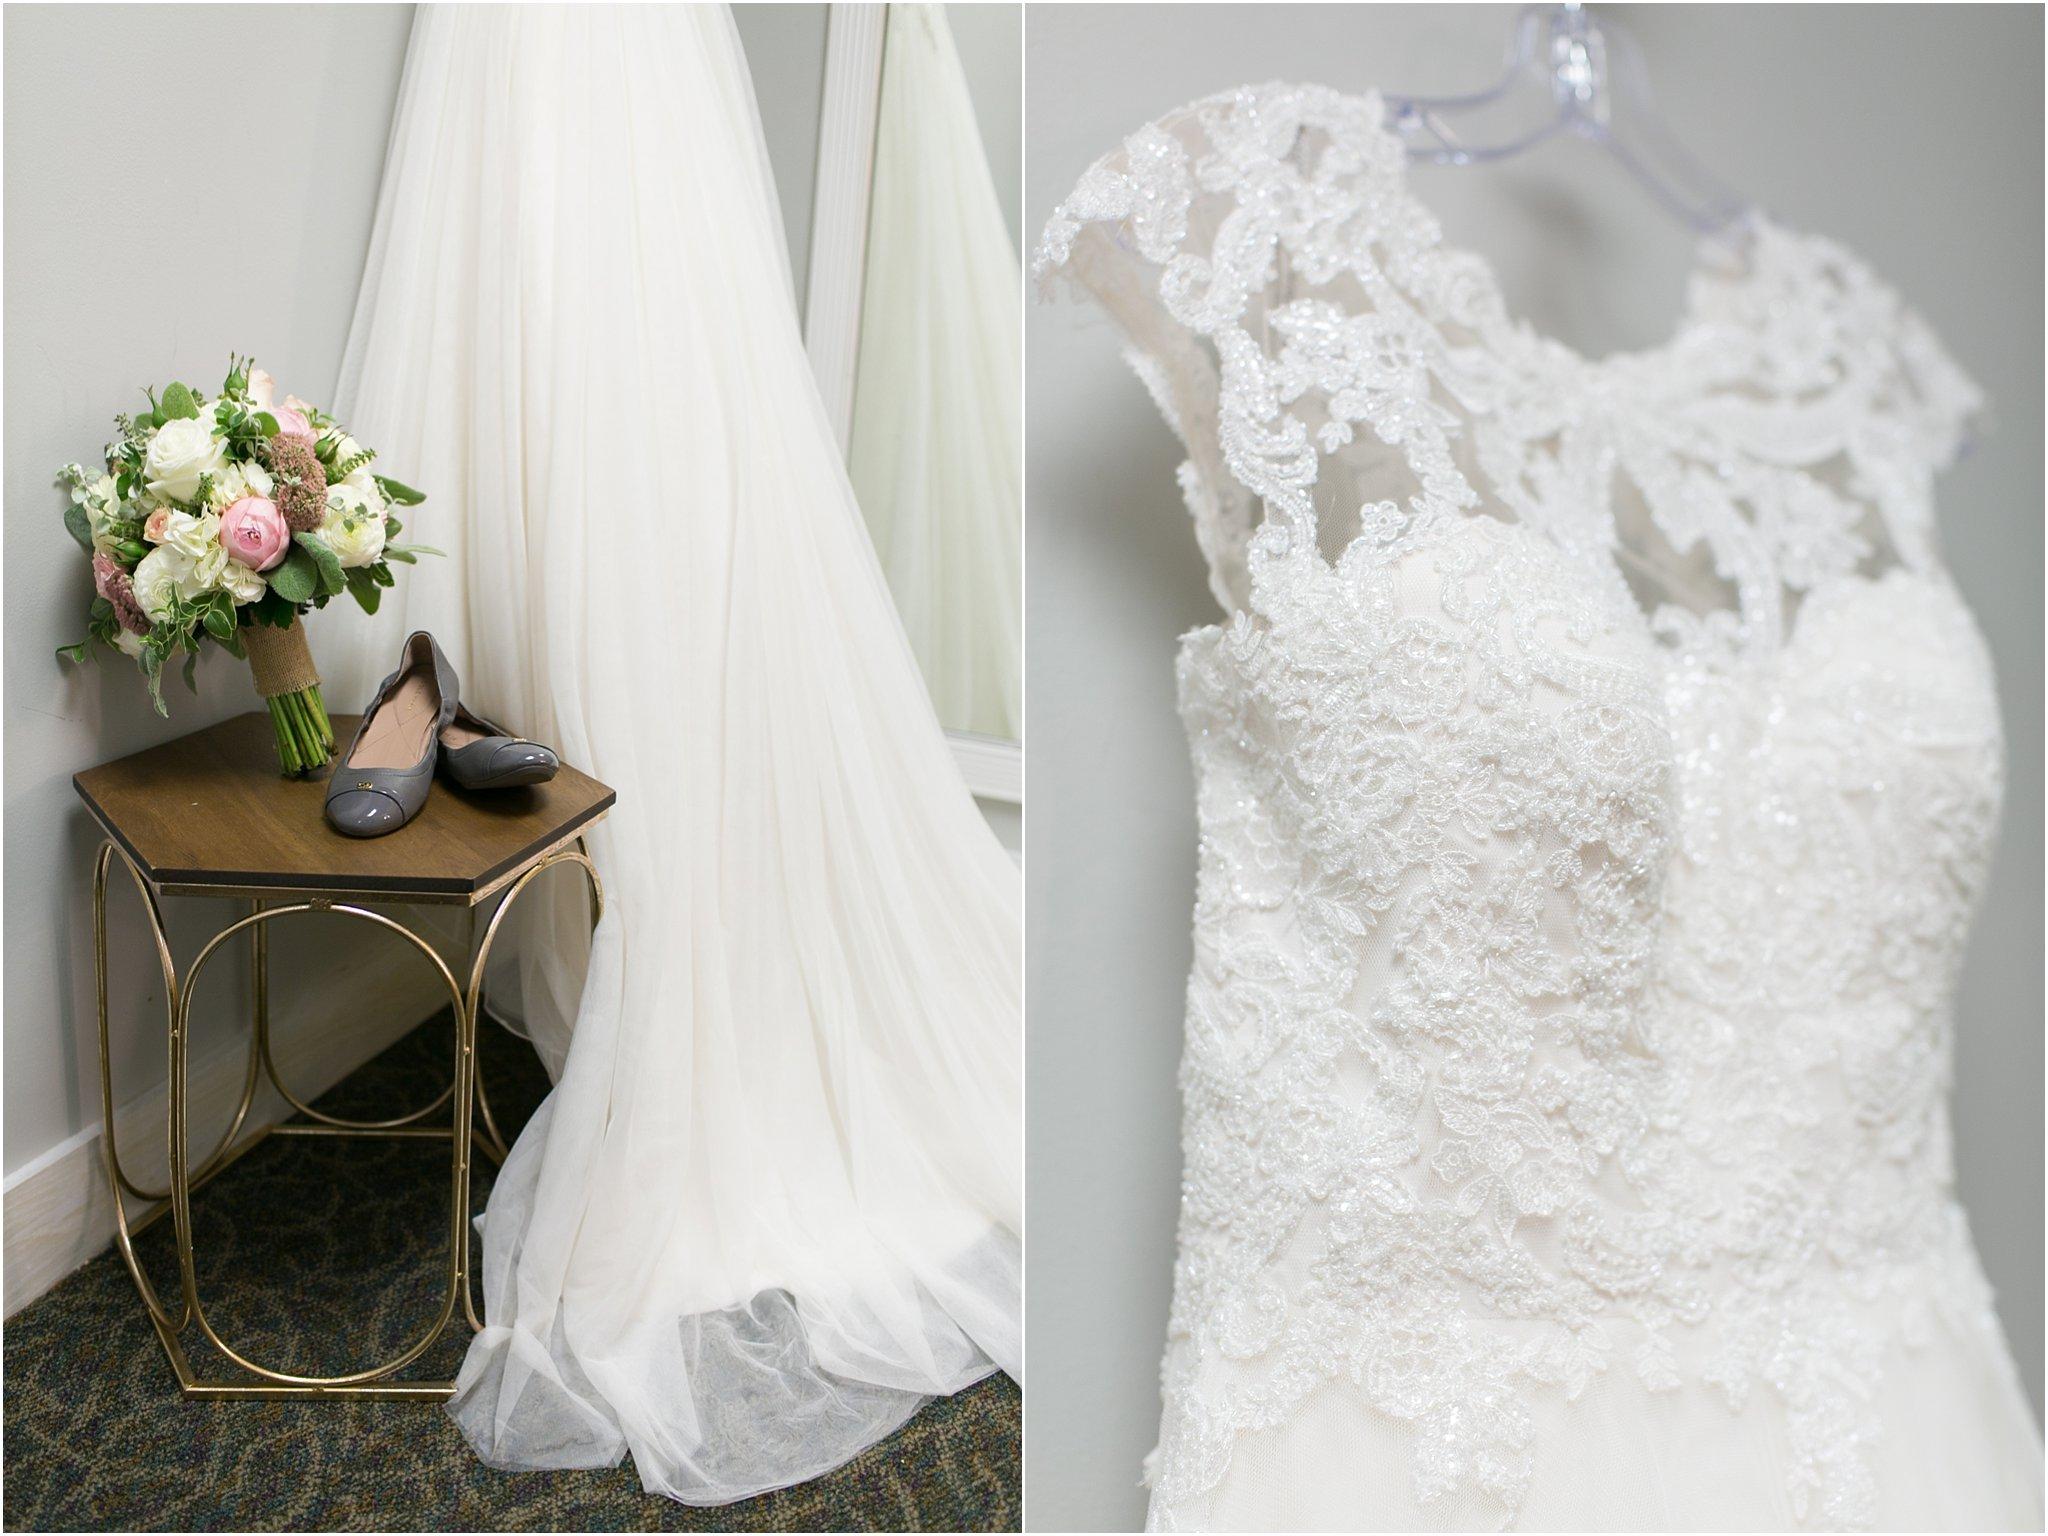 jessica_ryan_photography_virginia_wedding_photographer_wedding_hurricane_norfolk_botanical_gardens_hurricane_matthew_wedding_3542